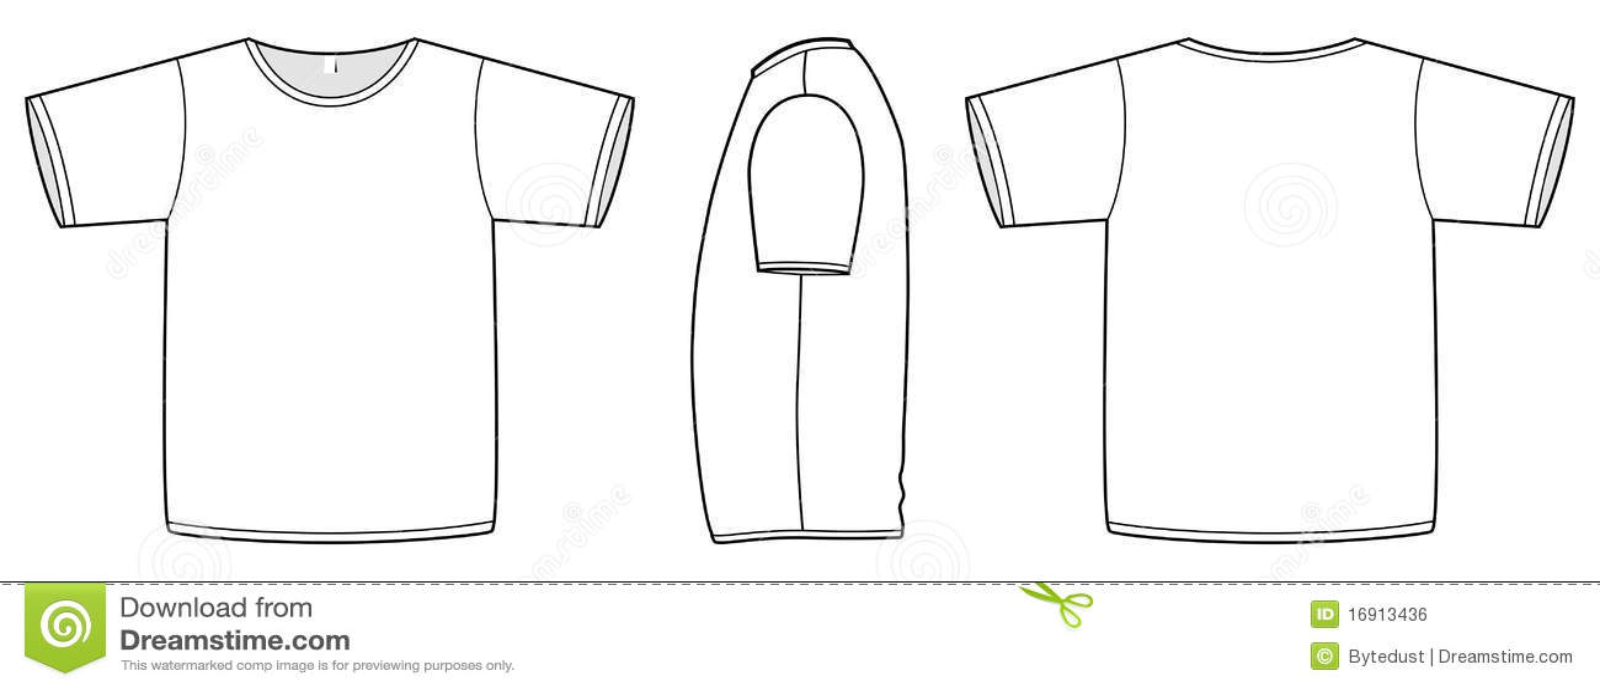 Basic Vector Unisex T-shirt Template Illustration Royalty Free - t shirt template